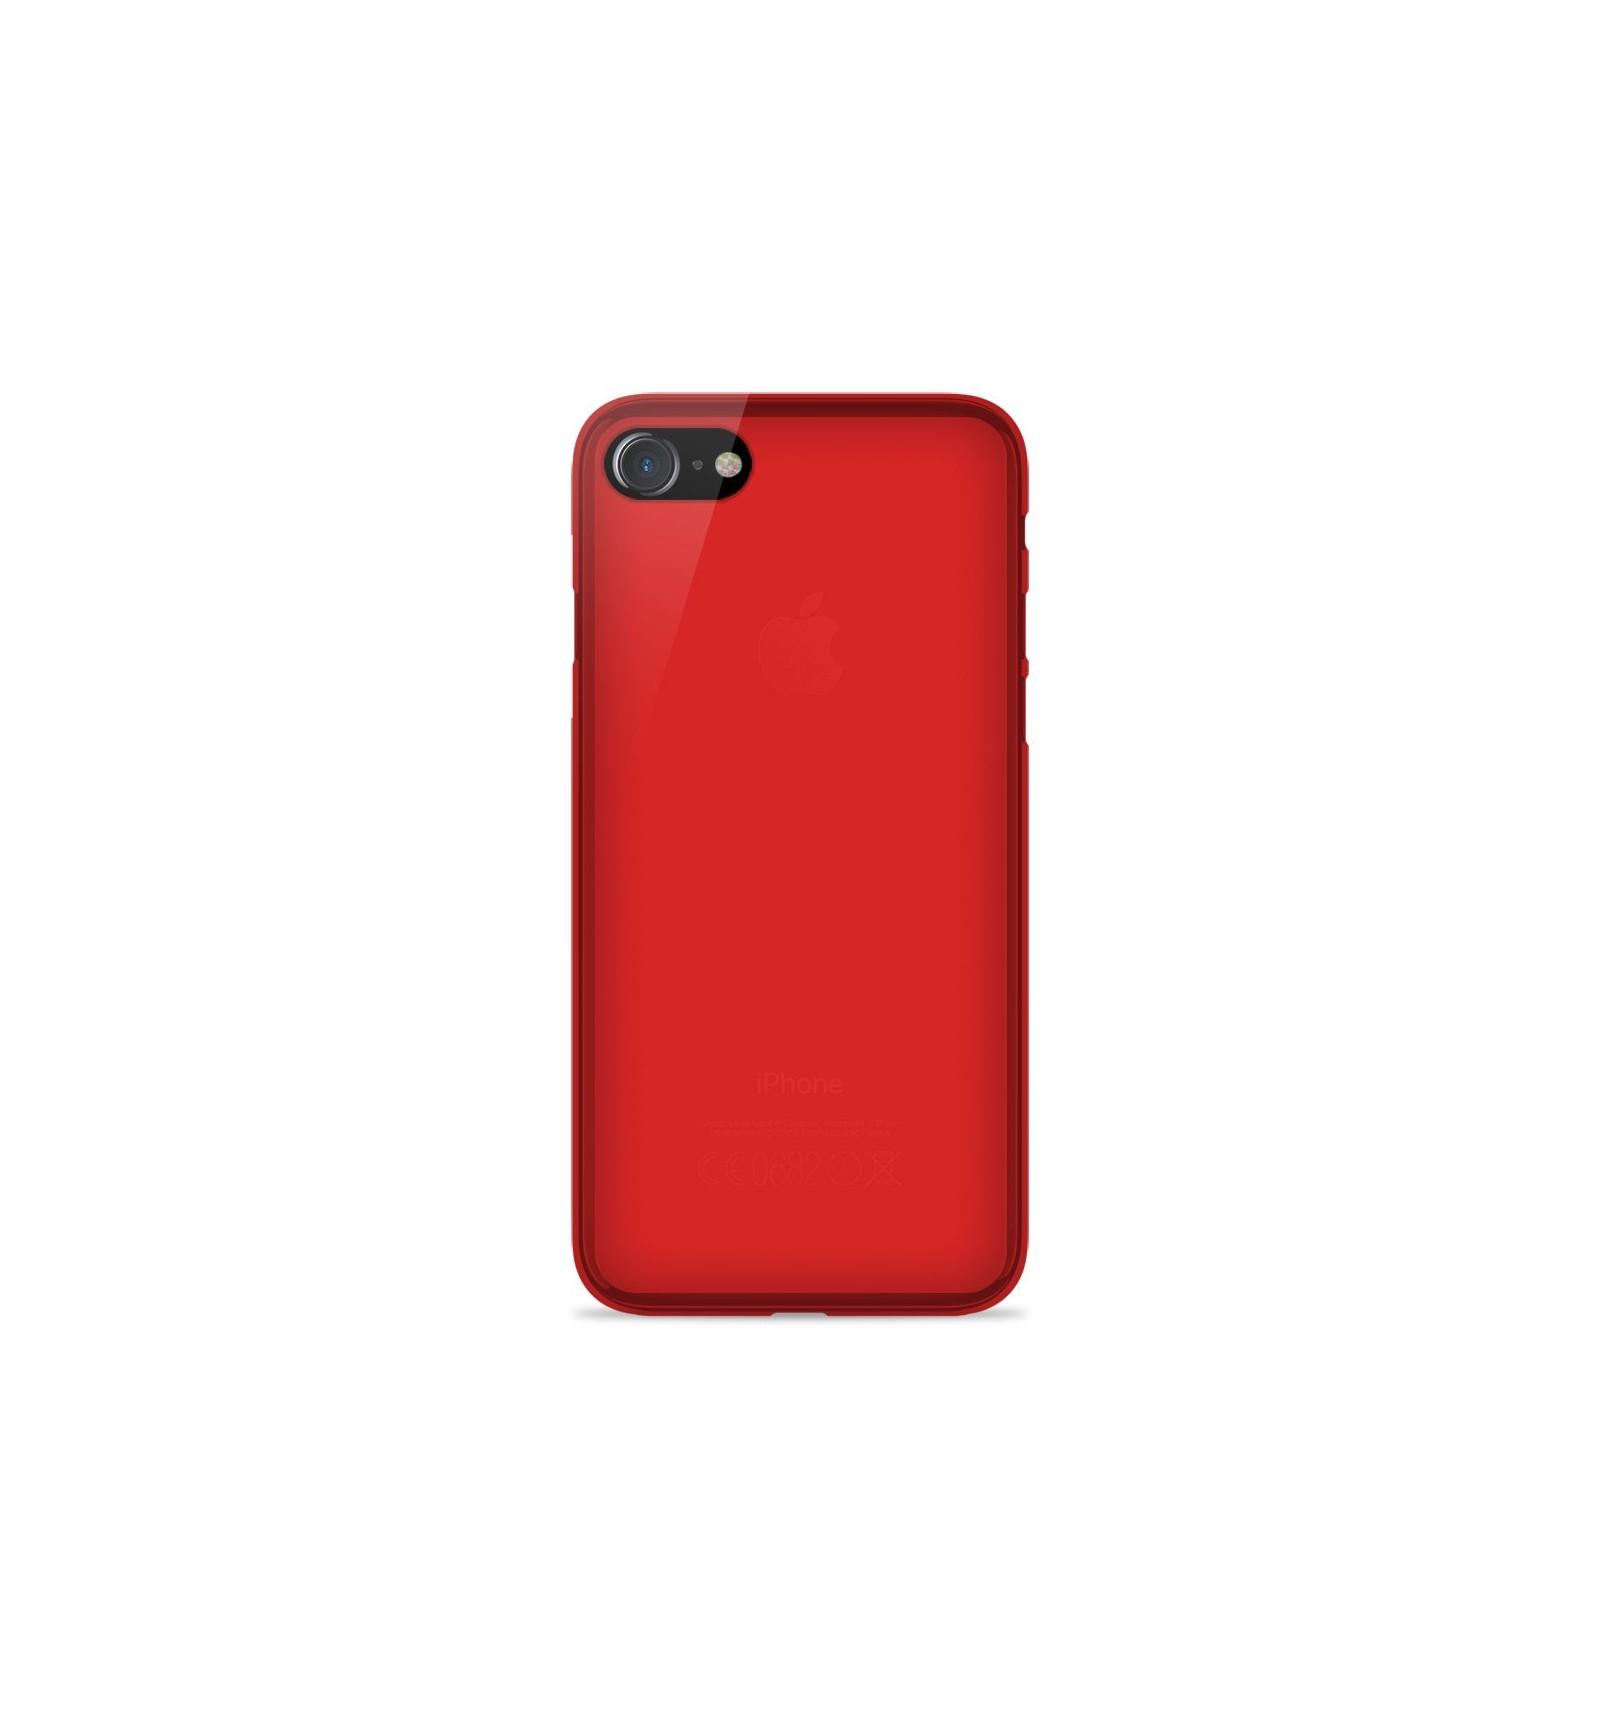 Coque Apple iPhone SE 2020 Silicone Gel givré - Rouge Translucide